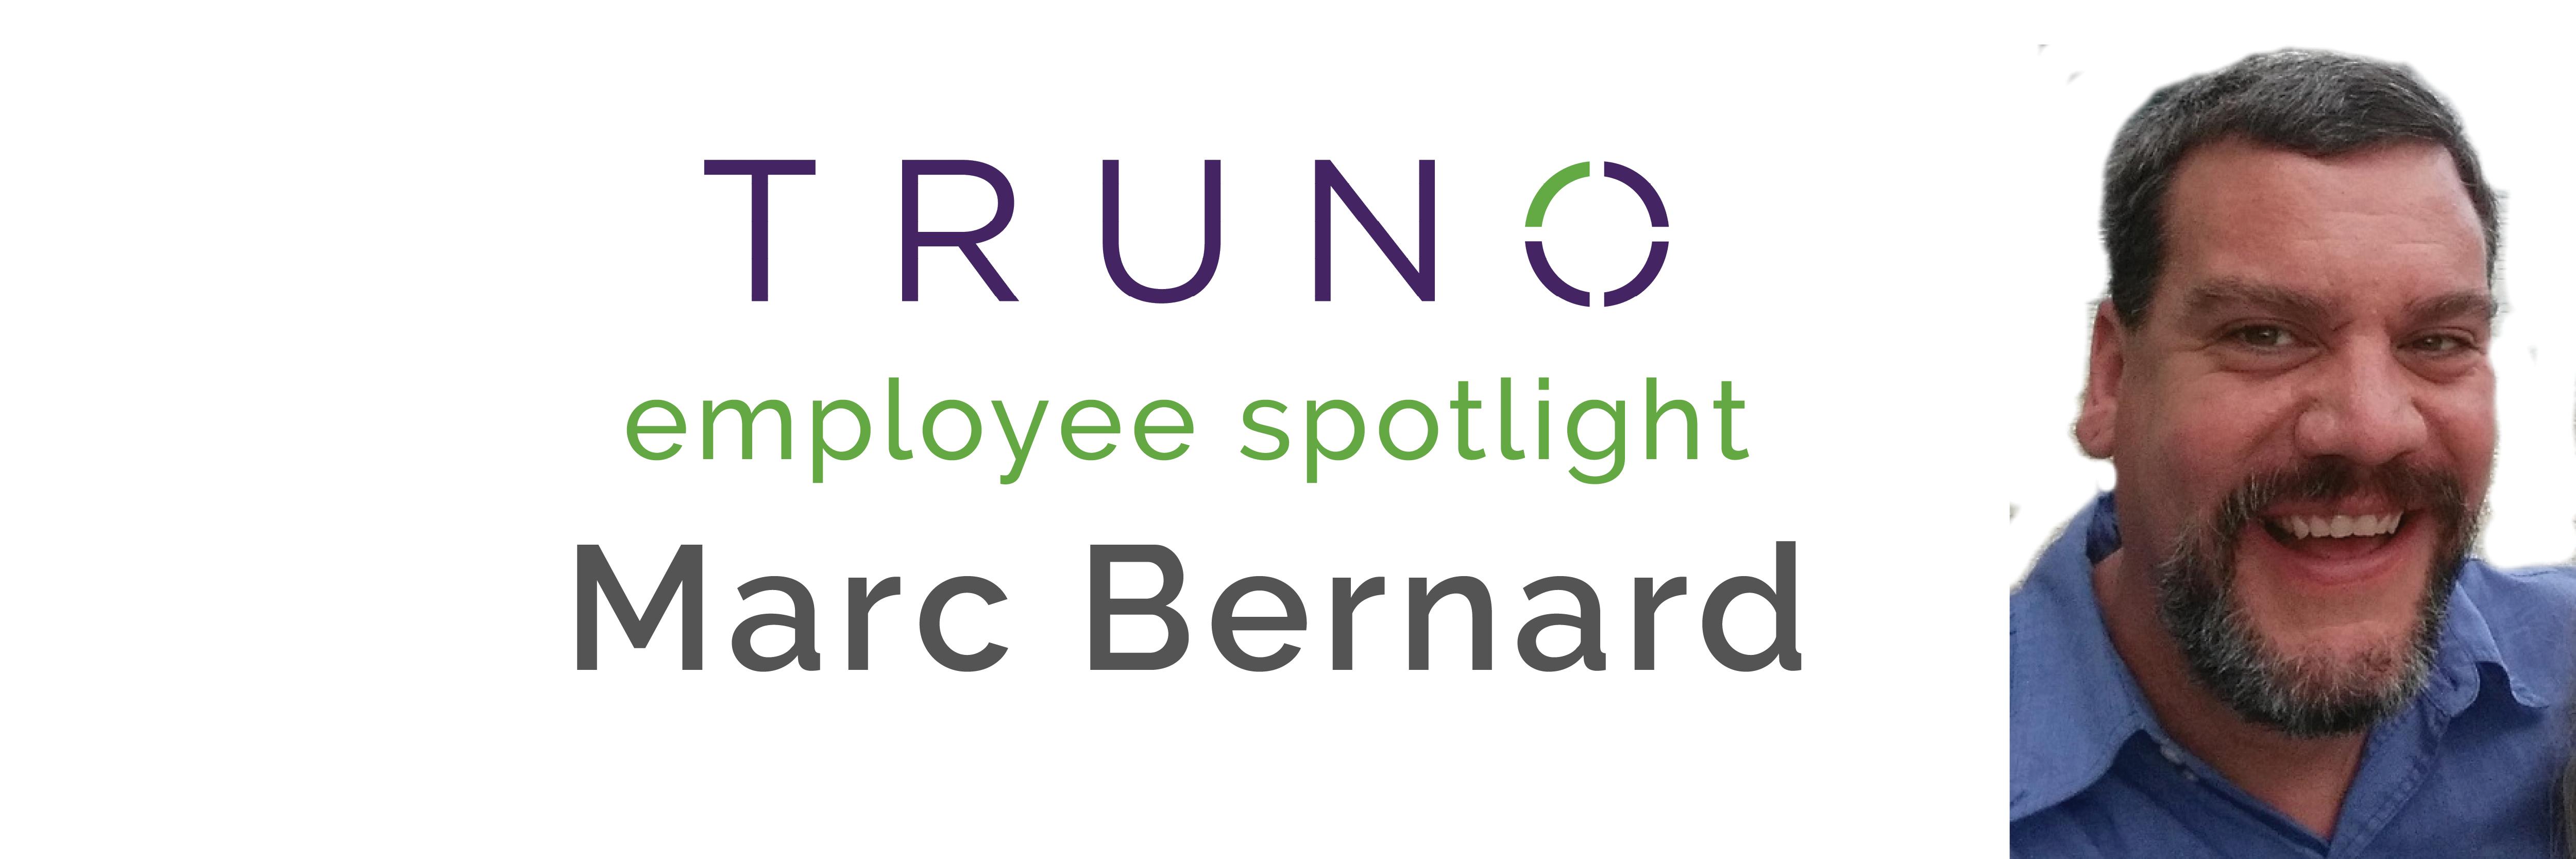 Employee Spotlight - Marc Bernard